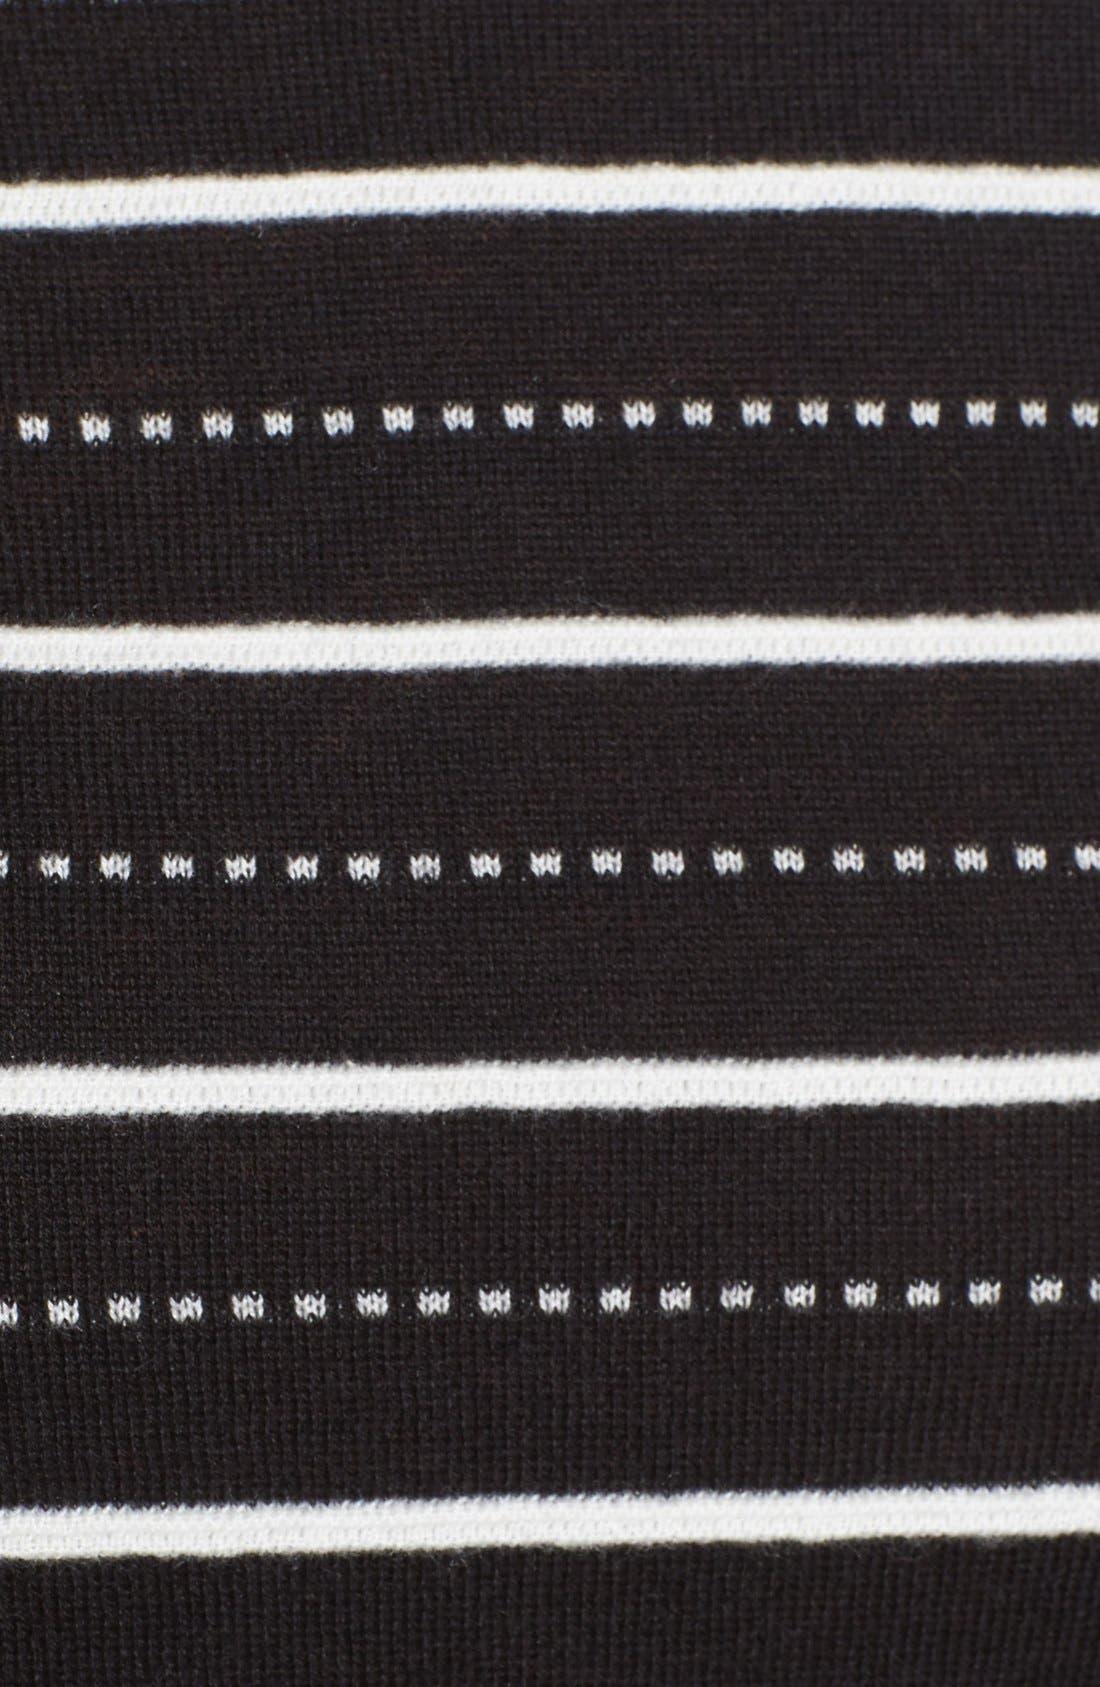 Cotton Blend Pullover,                             Alternate thumbnail 131, color,